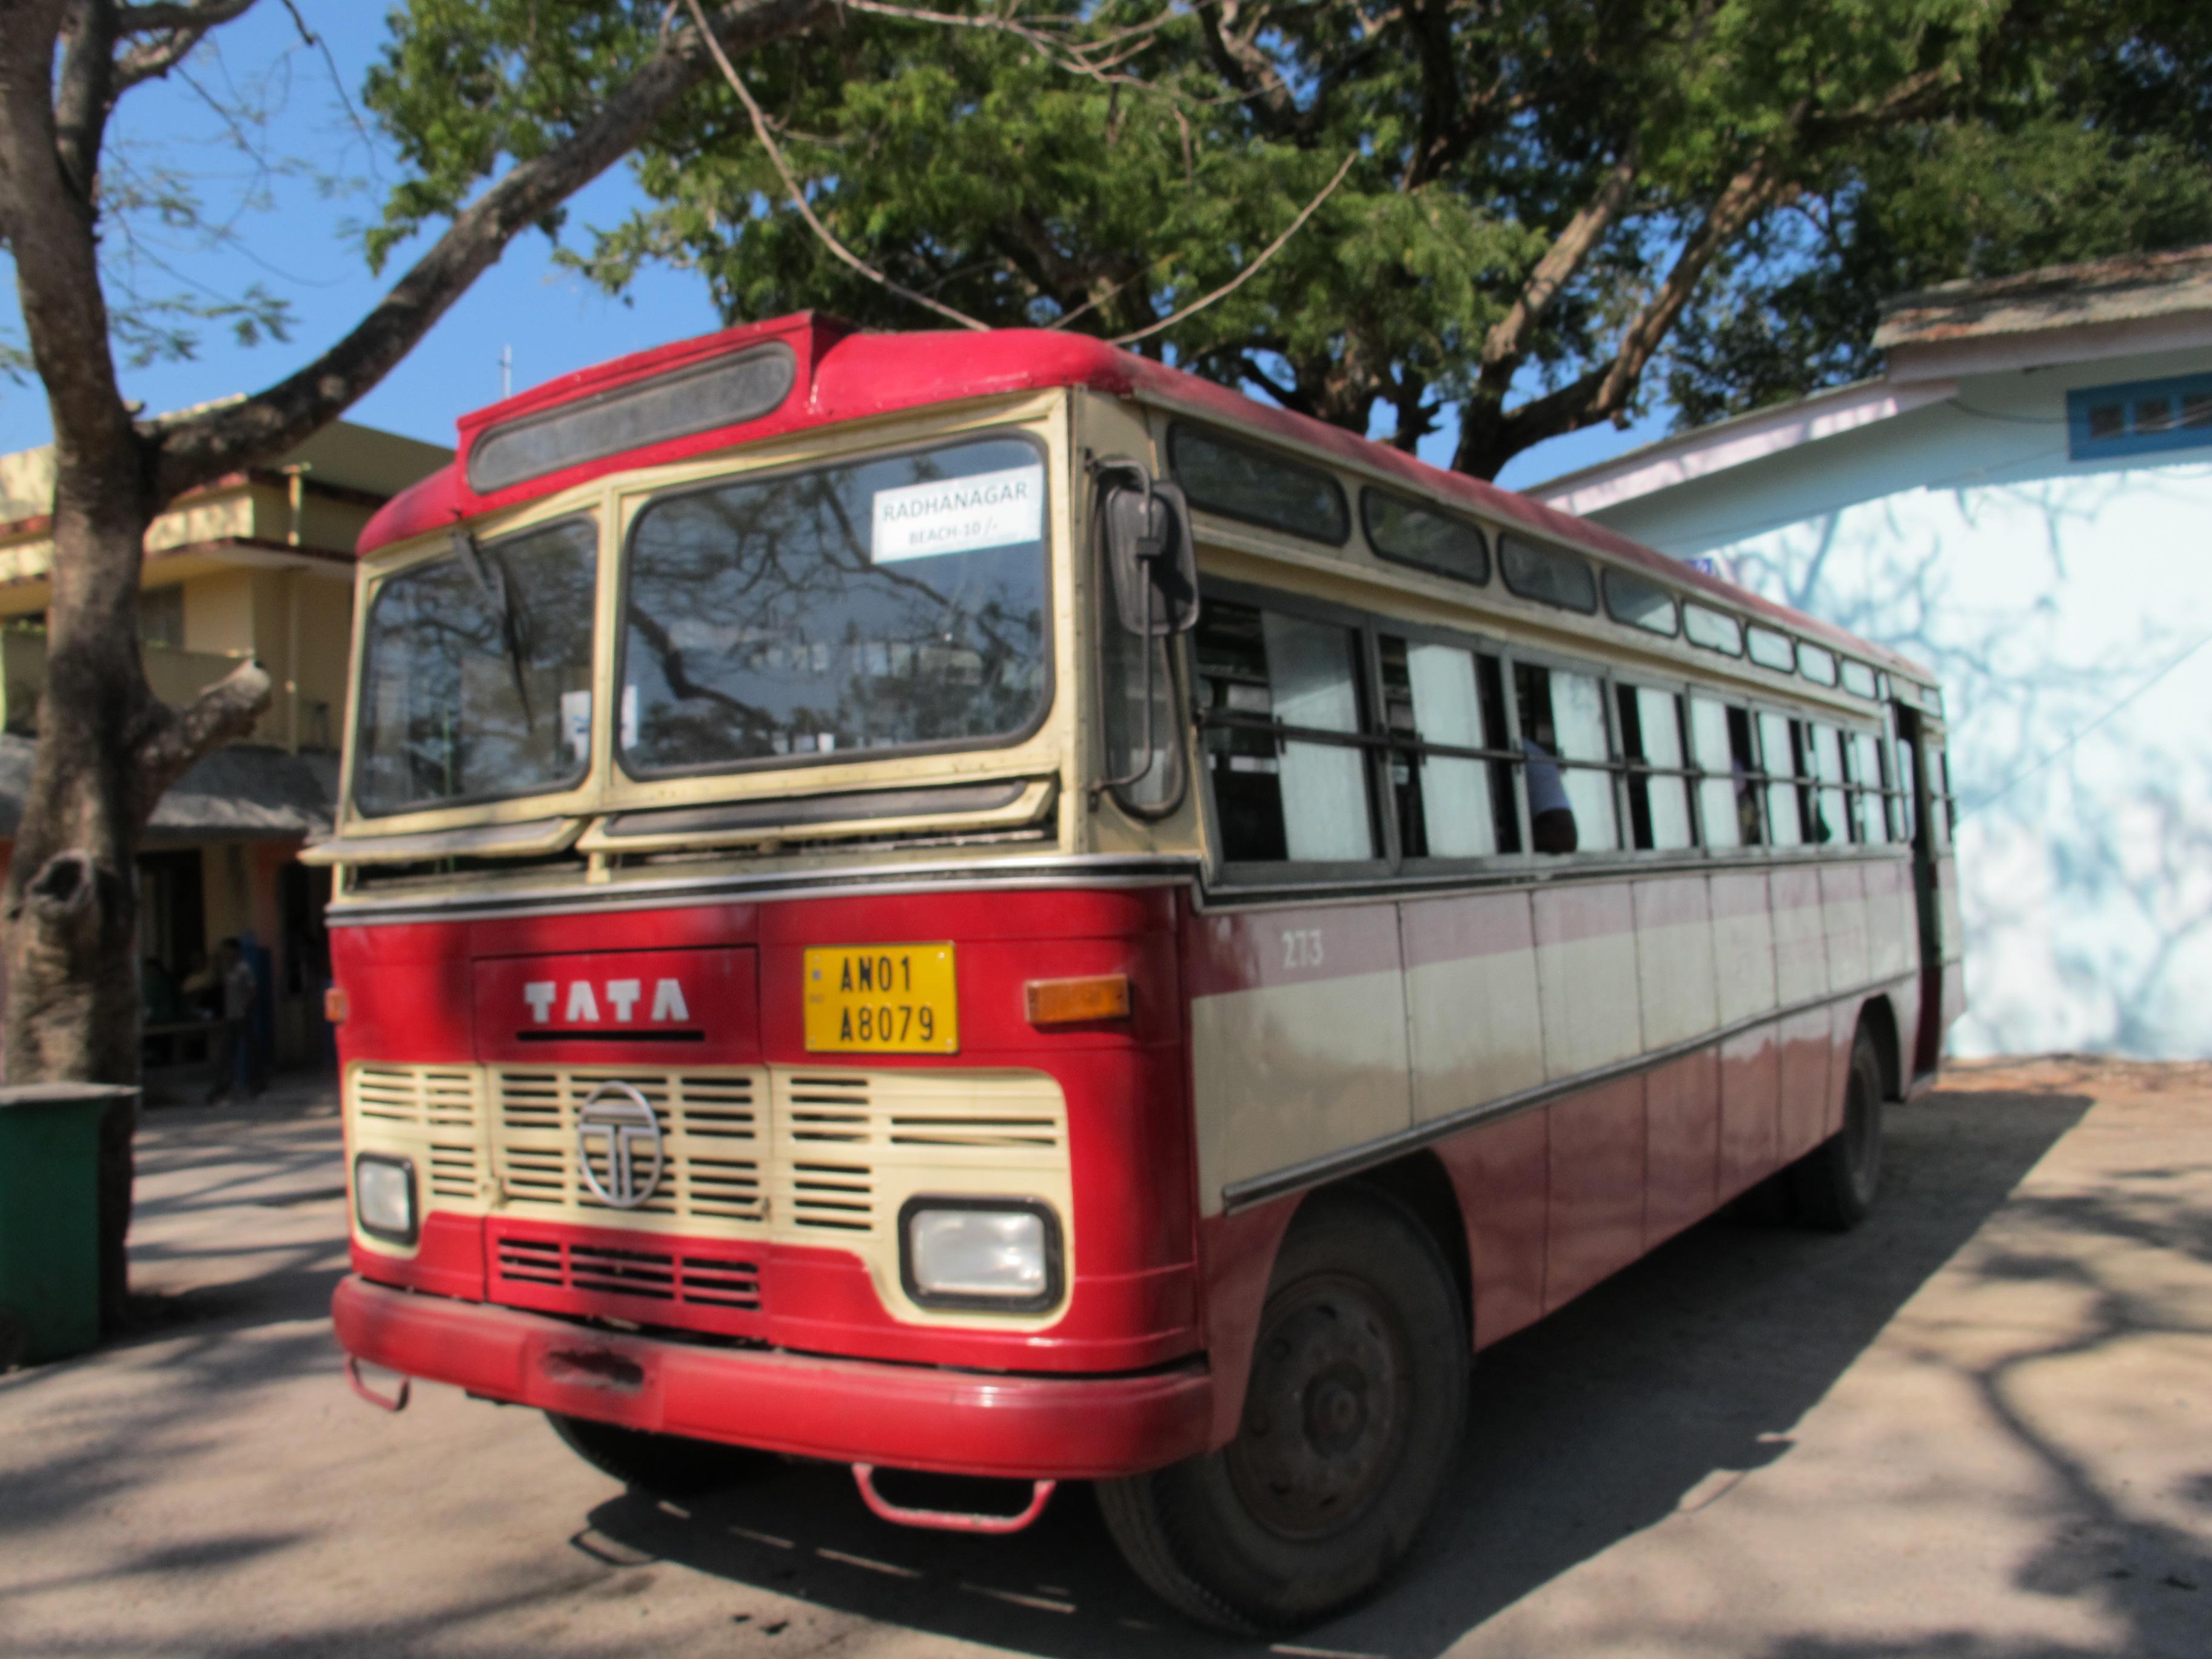 Автобус до пляжа Радханагар, bus to Radhanagar Beach